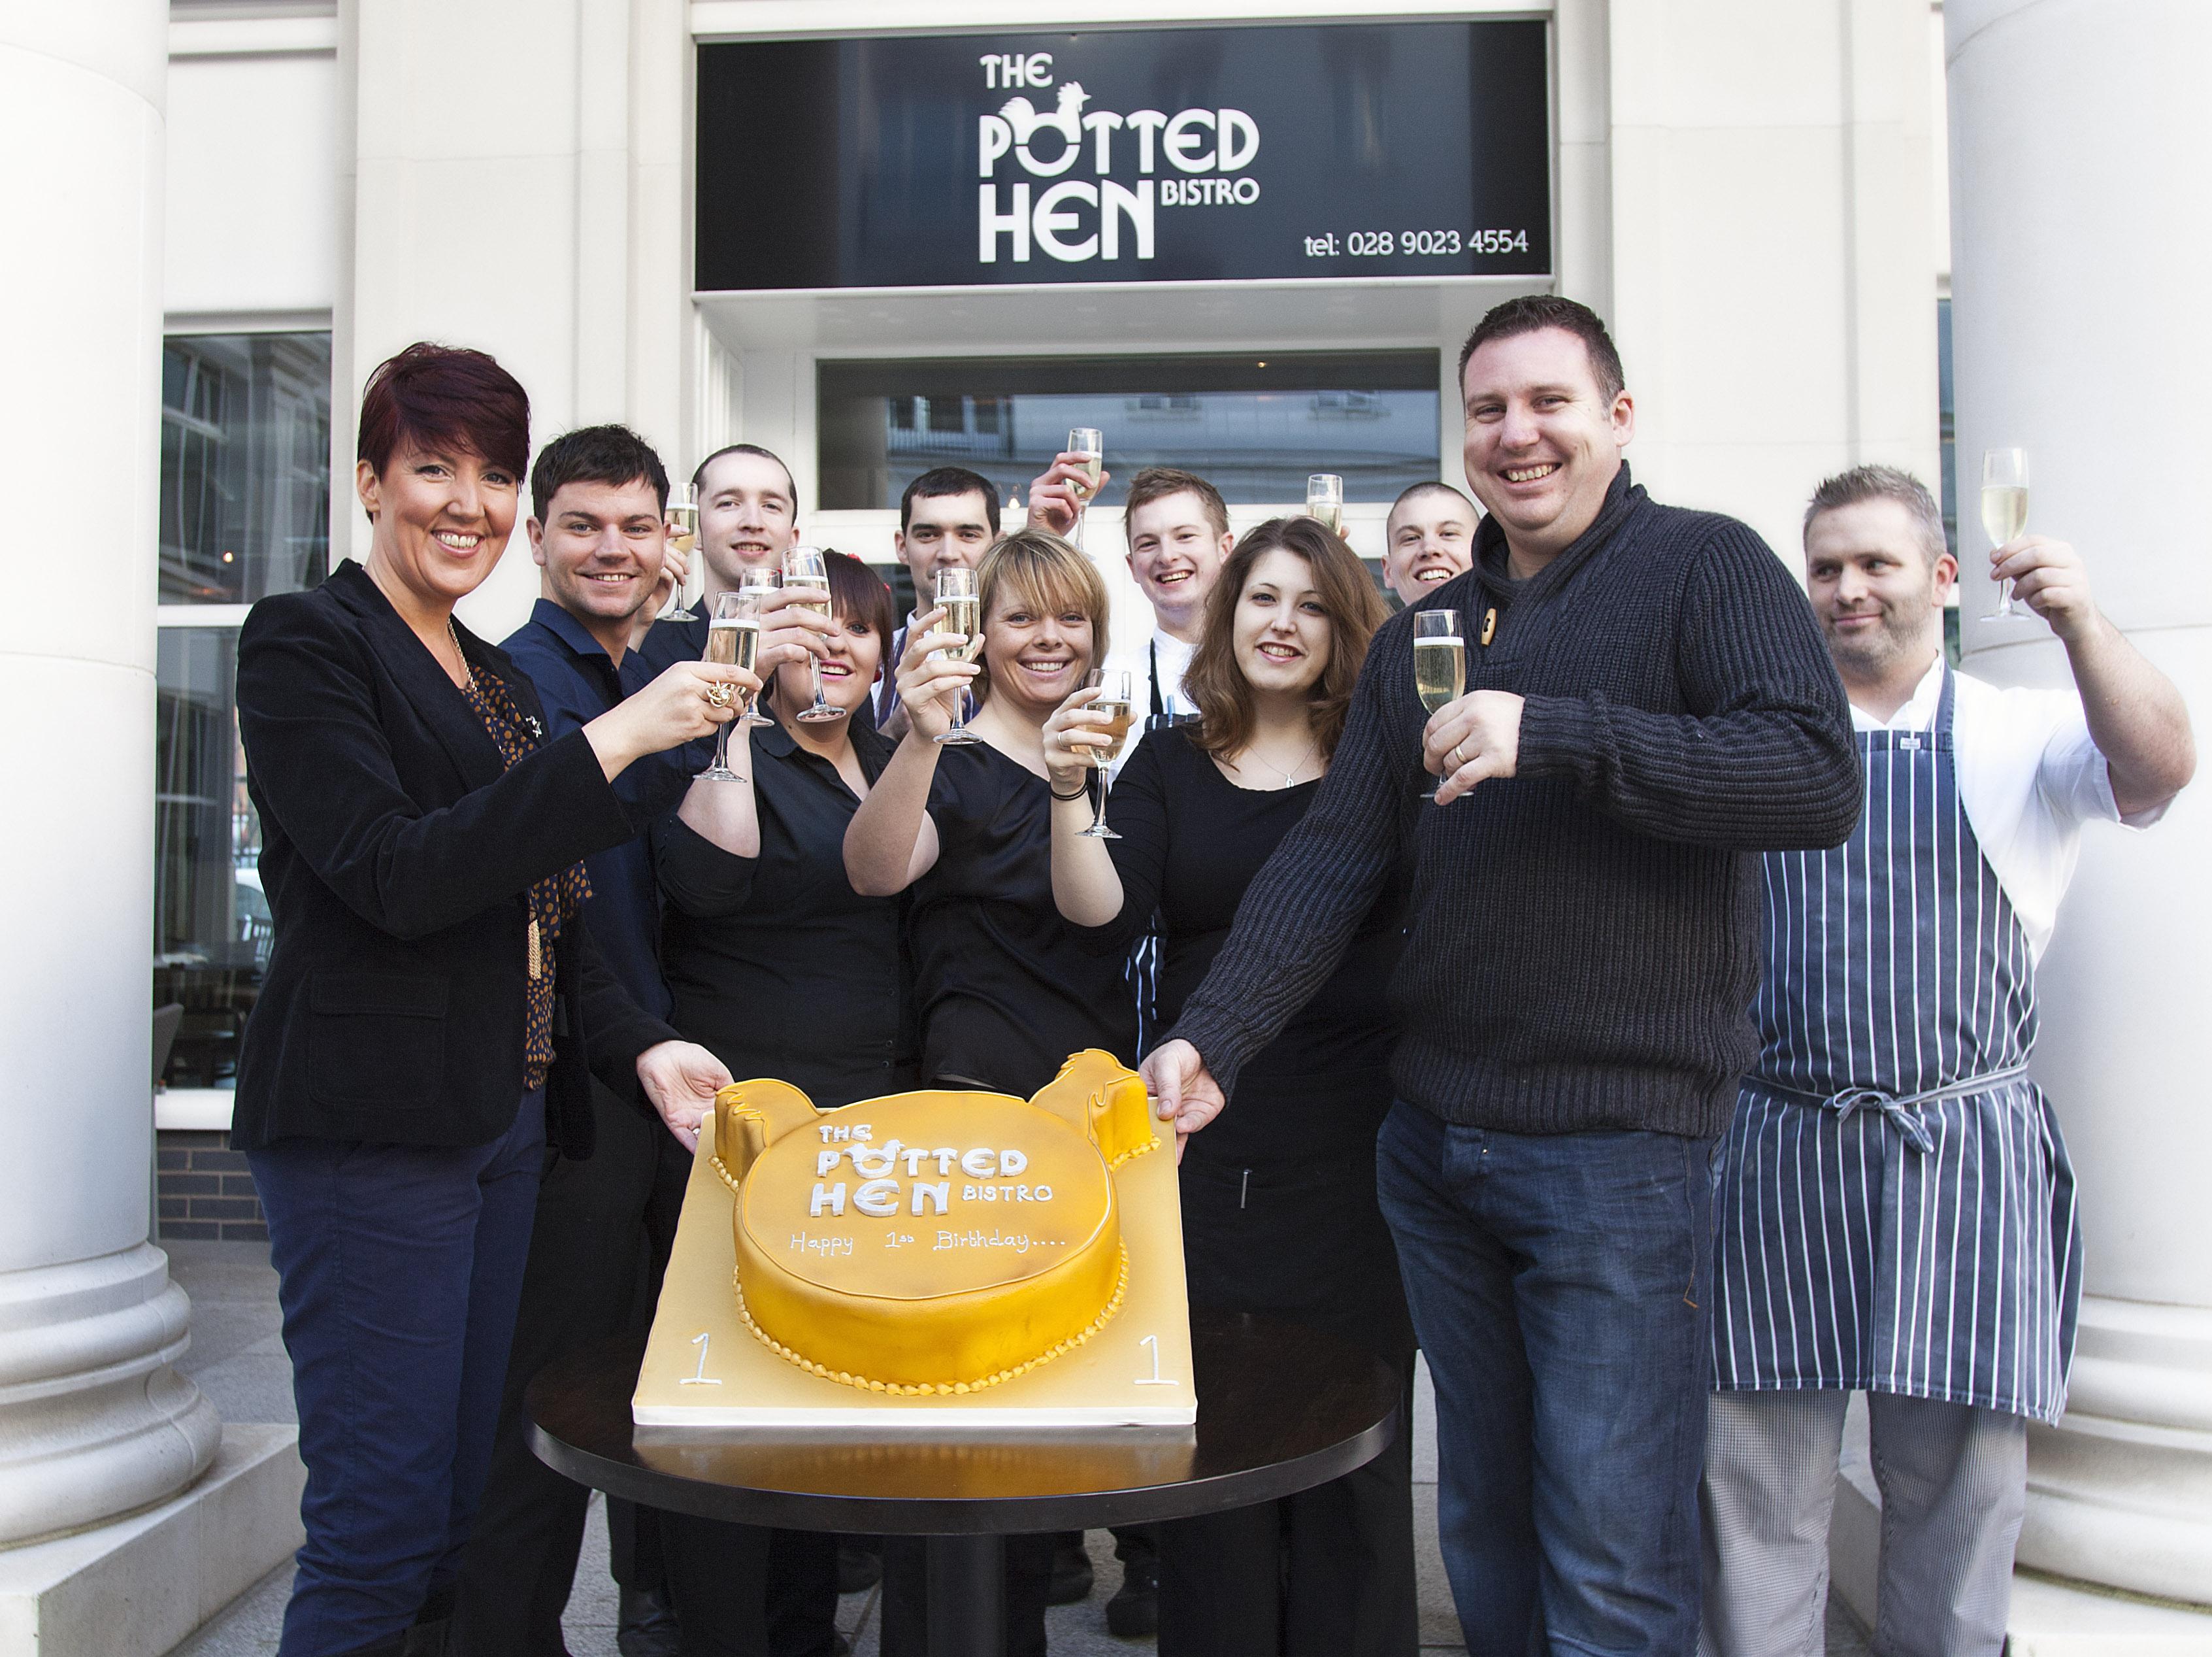 'Hen Party' as Belfast bistro celebrates first anniversary